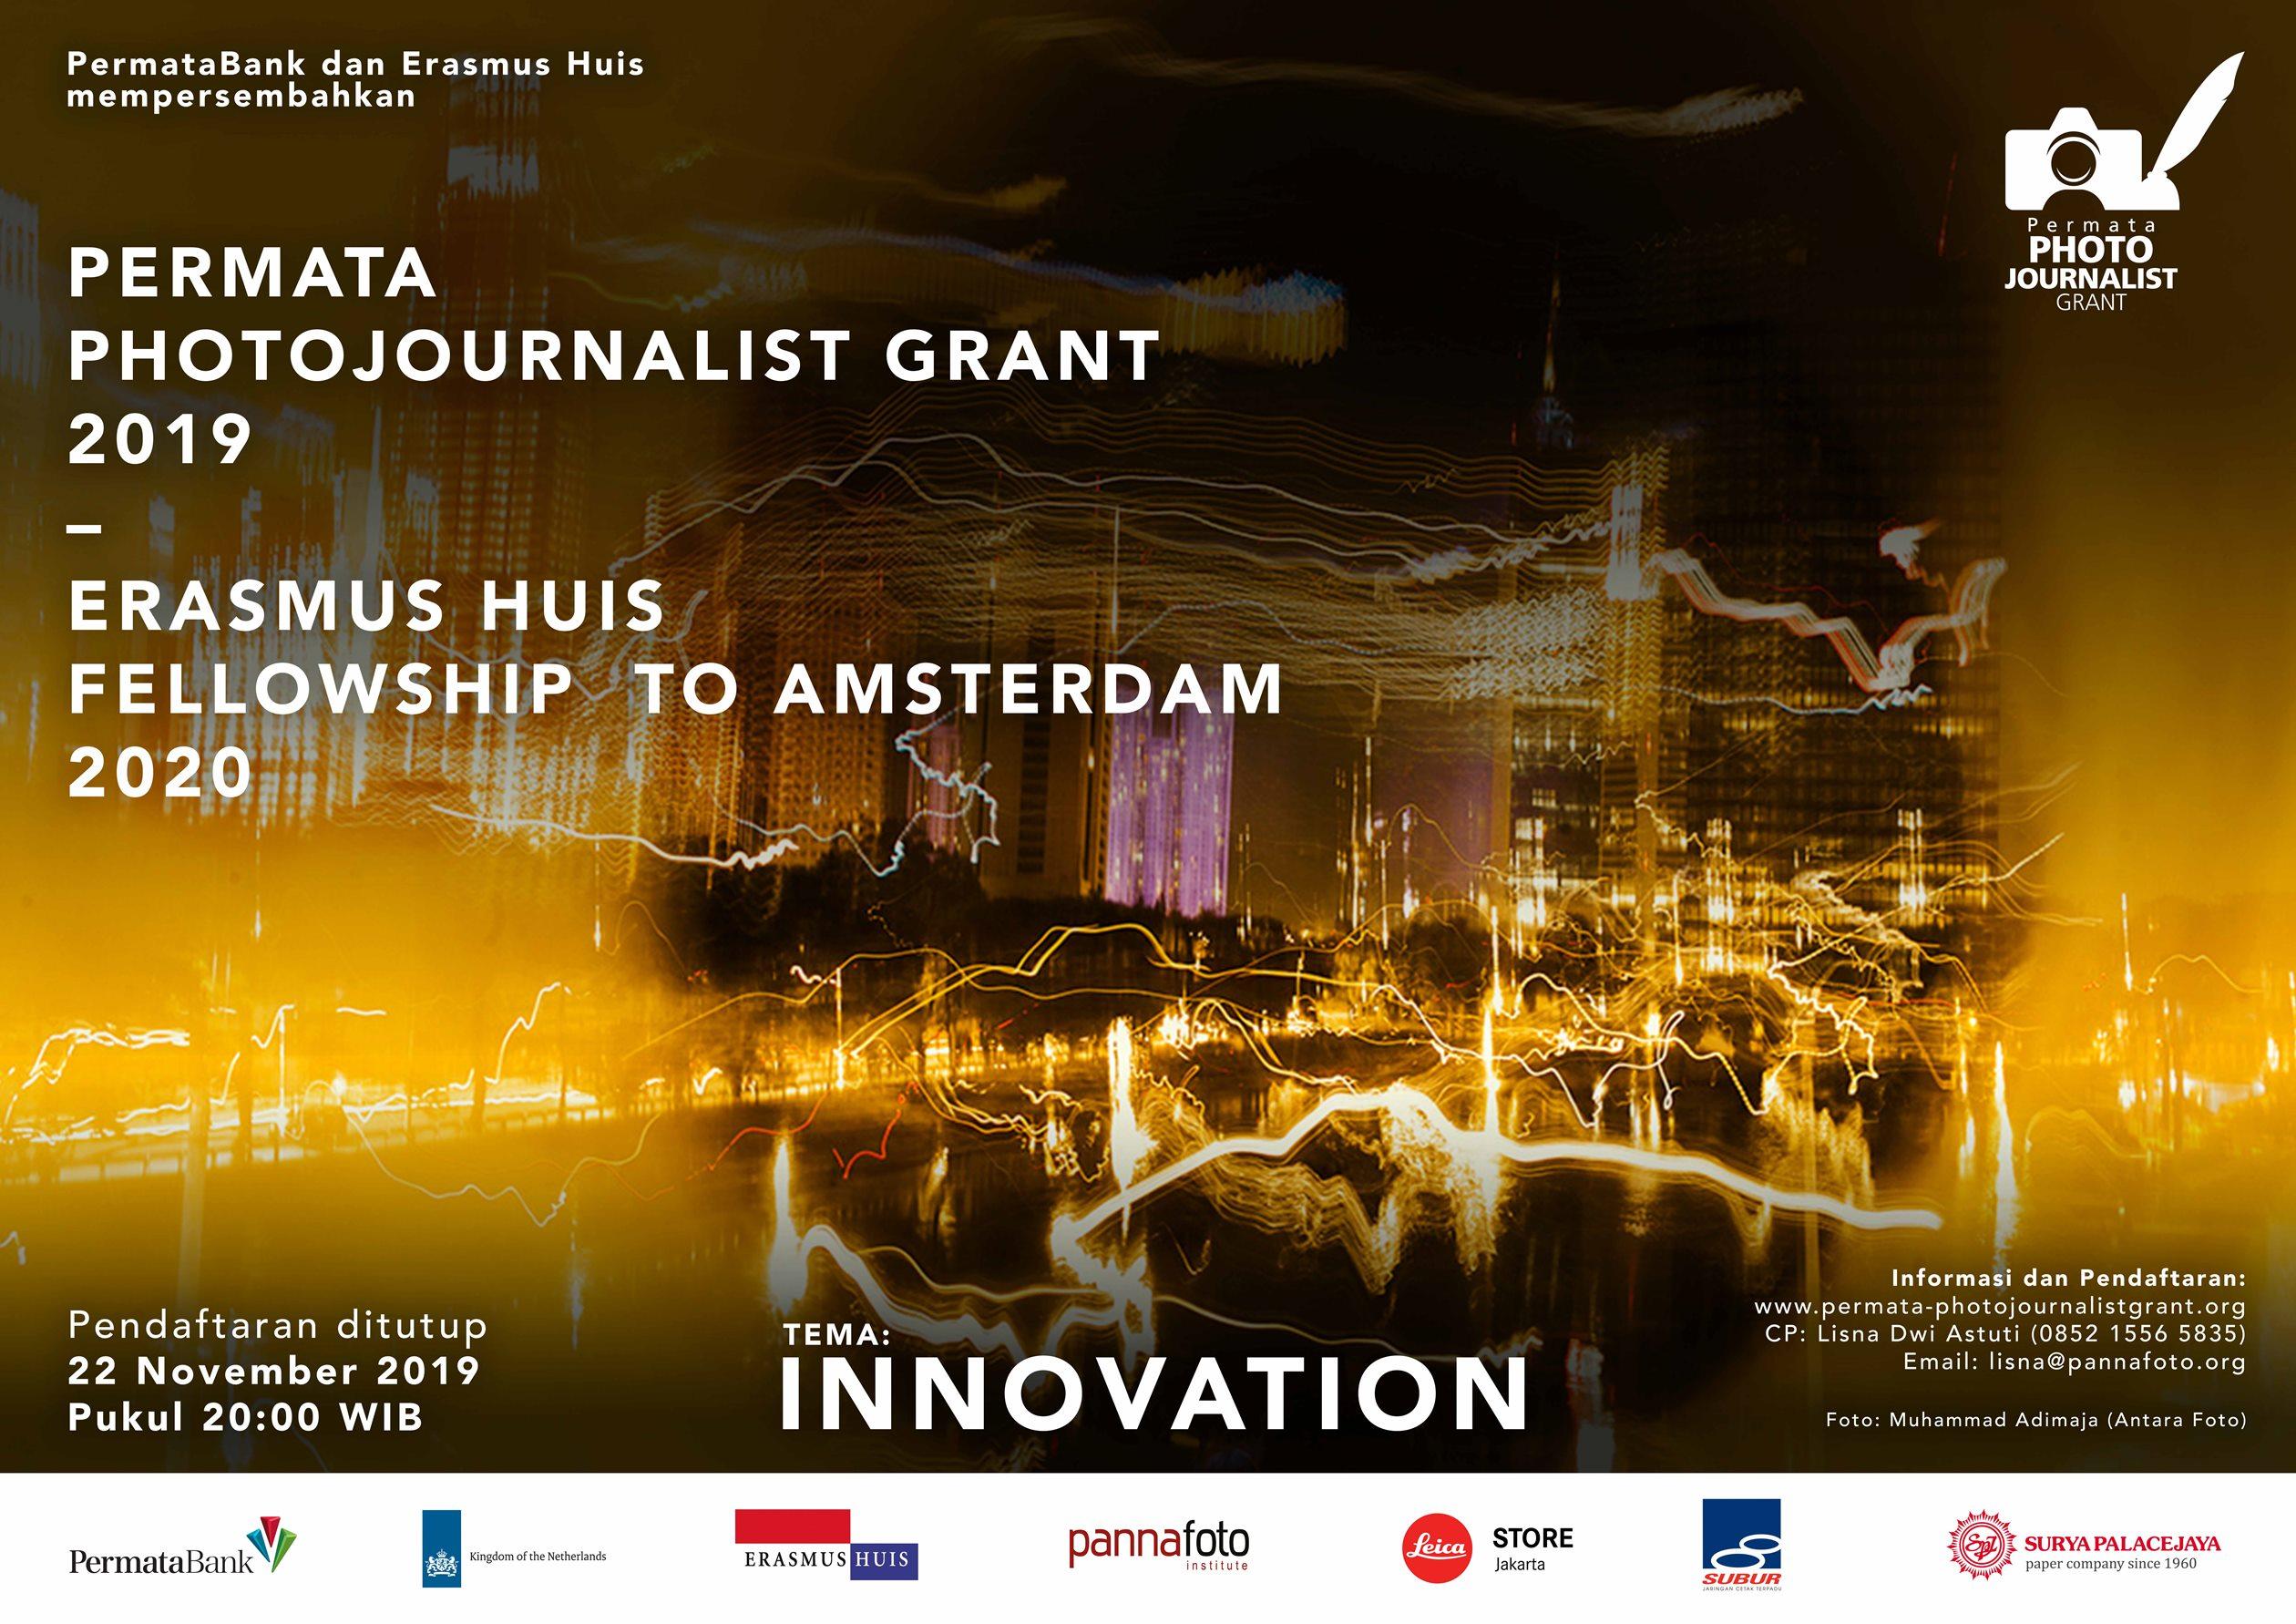 Permata Photojournalist Grant 2019 - Erasmus Huis Fellowship to Amsterdam 2020